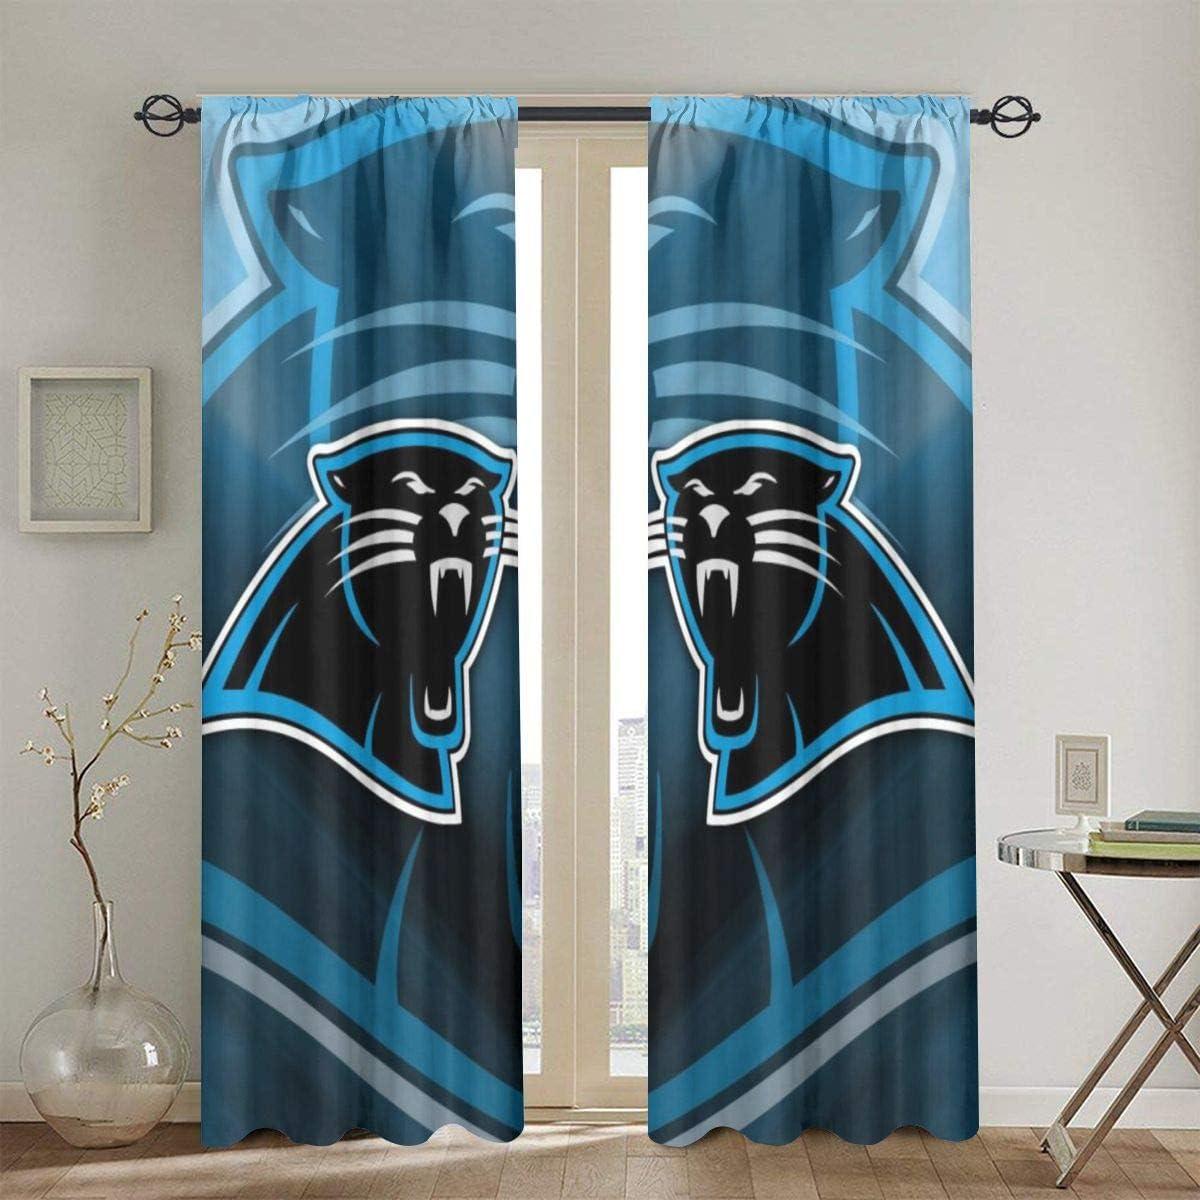 Amazon Com Rwnfa Panther Leopard Blackout Window Curtain Panels 36 W X 63 L Energy Efficient Rod Pocket Window Draperies For Living Room Bedroom 2 Panels Home Kitchen